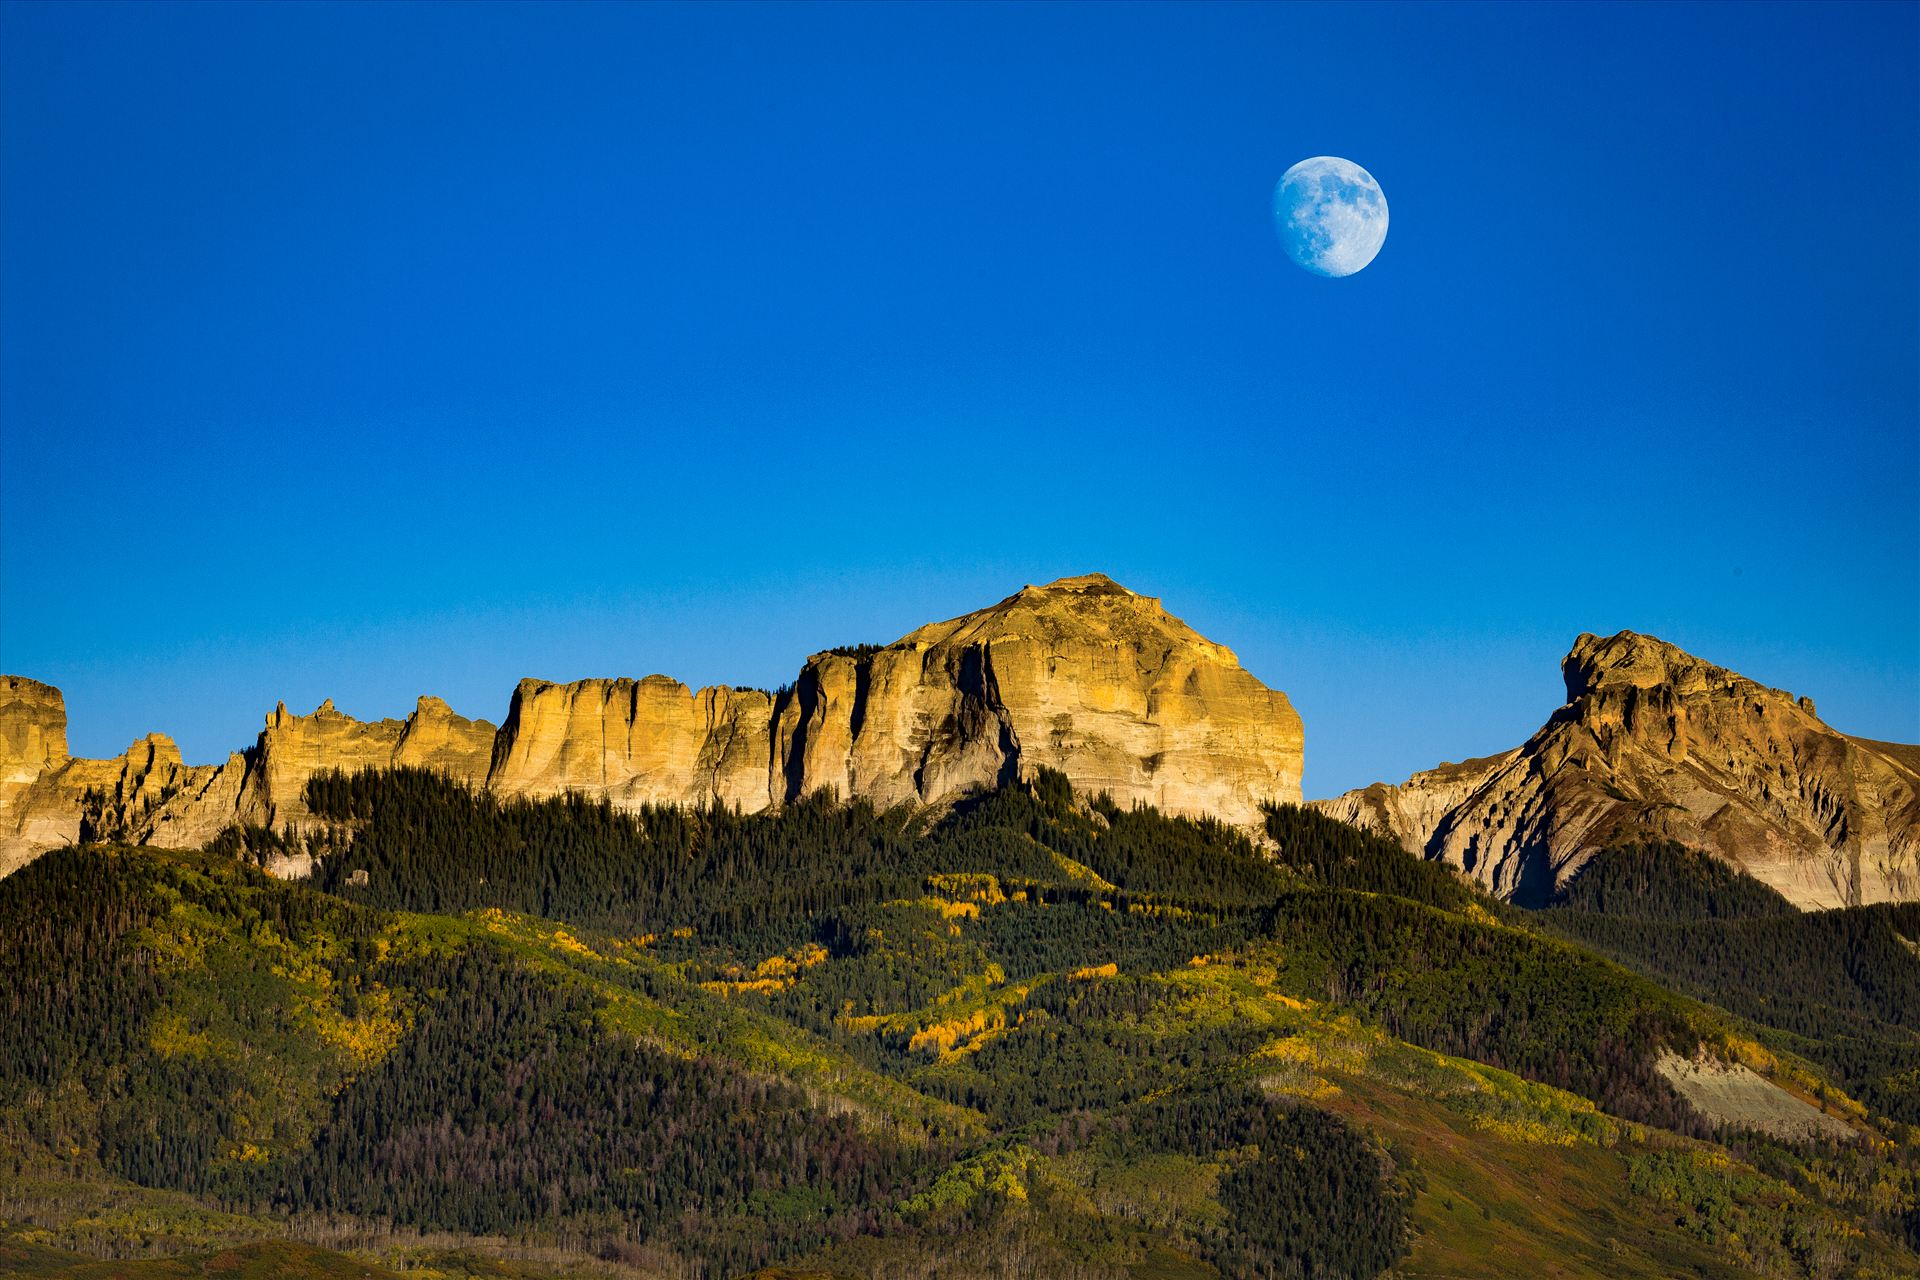 Moonrise over Chimney Peak - The moon rises over Chimney Peak outside of Ridgeway, Colorado. by D Scott Smith